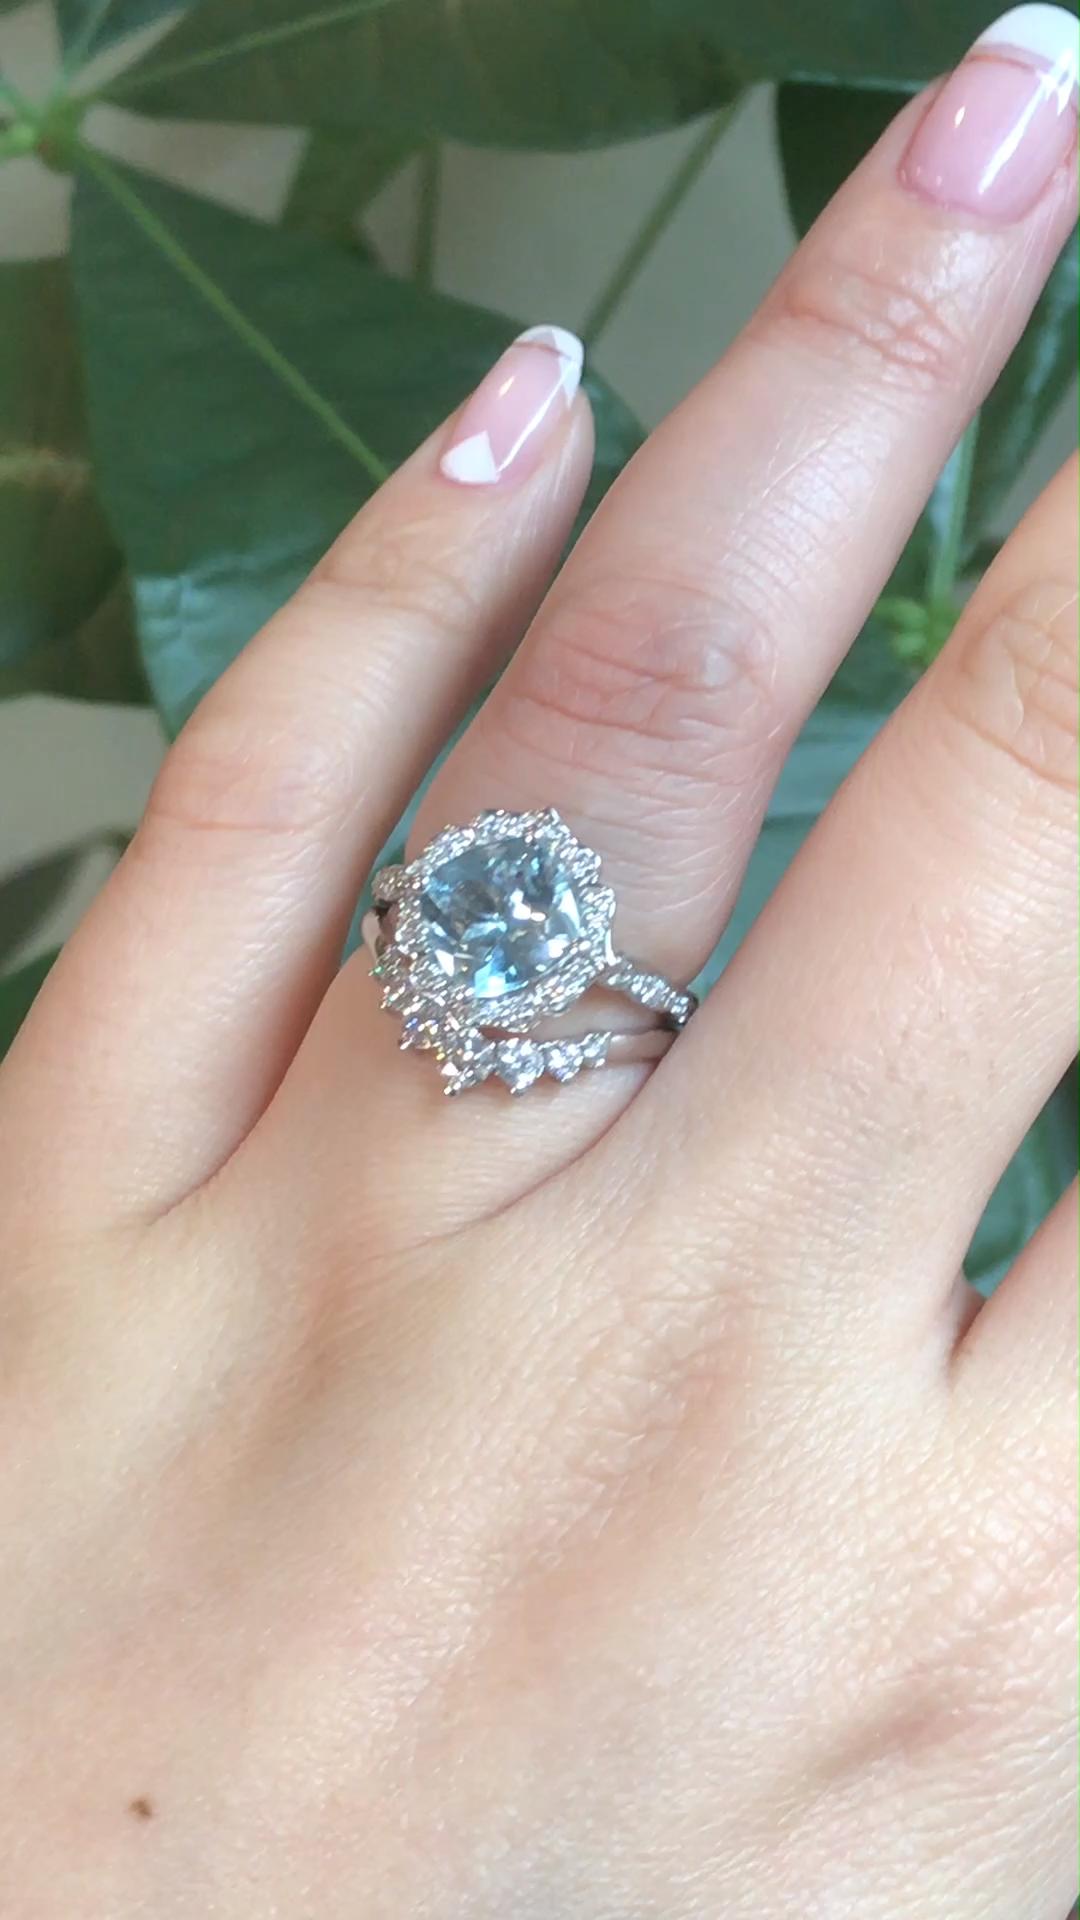 Aquamarine Vintage Floral Bridal Ring Set by La More Design #aquamarineengagementring